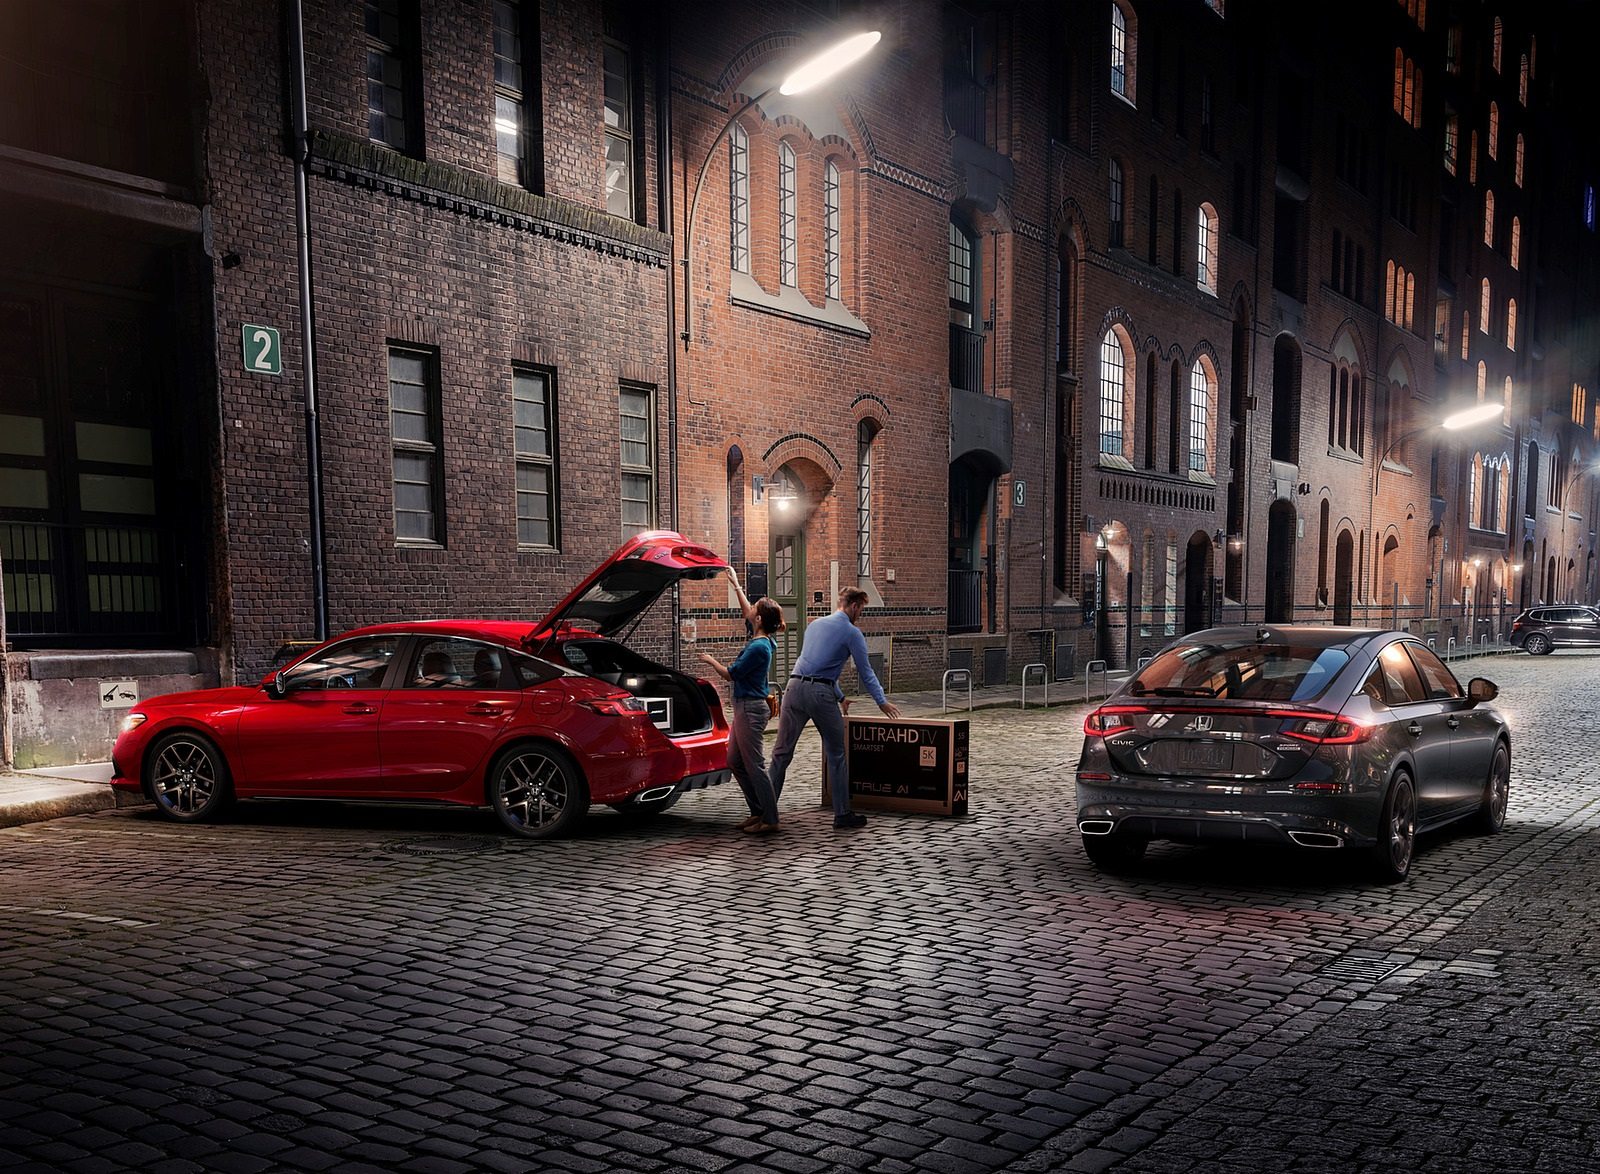 2022 Honda Civic Hatchback Wallpapers (5)